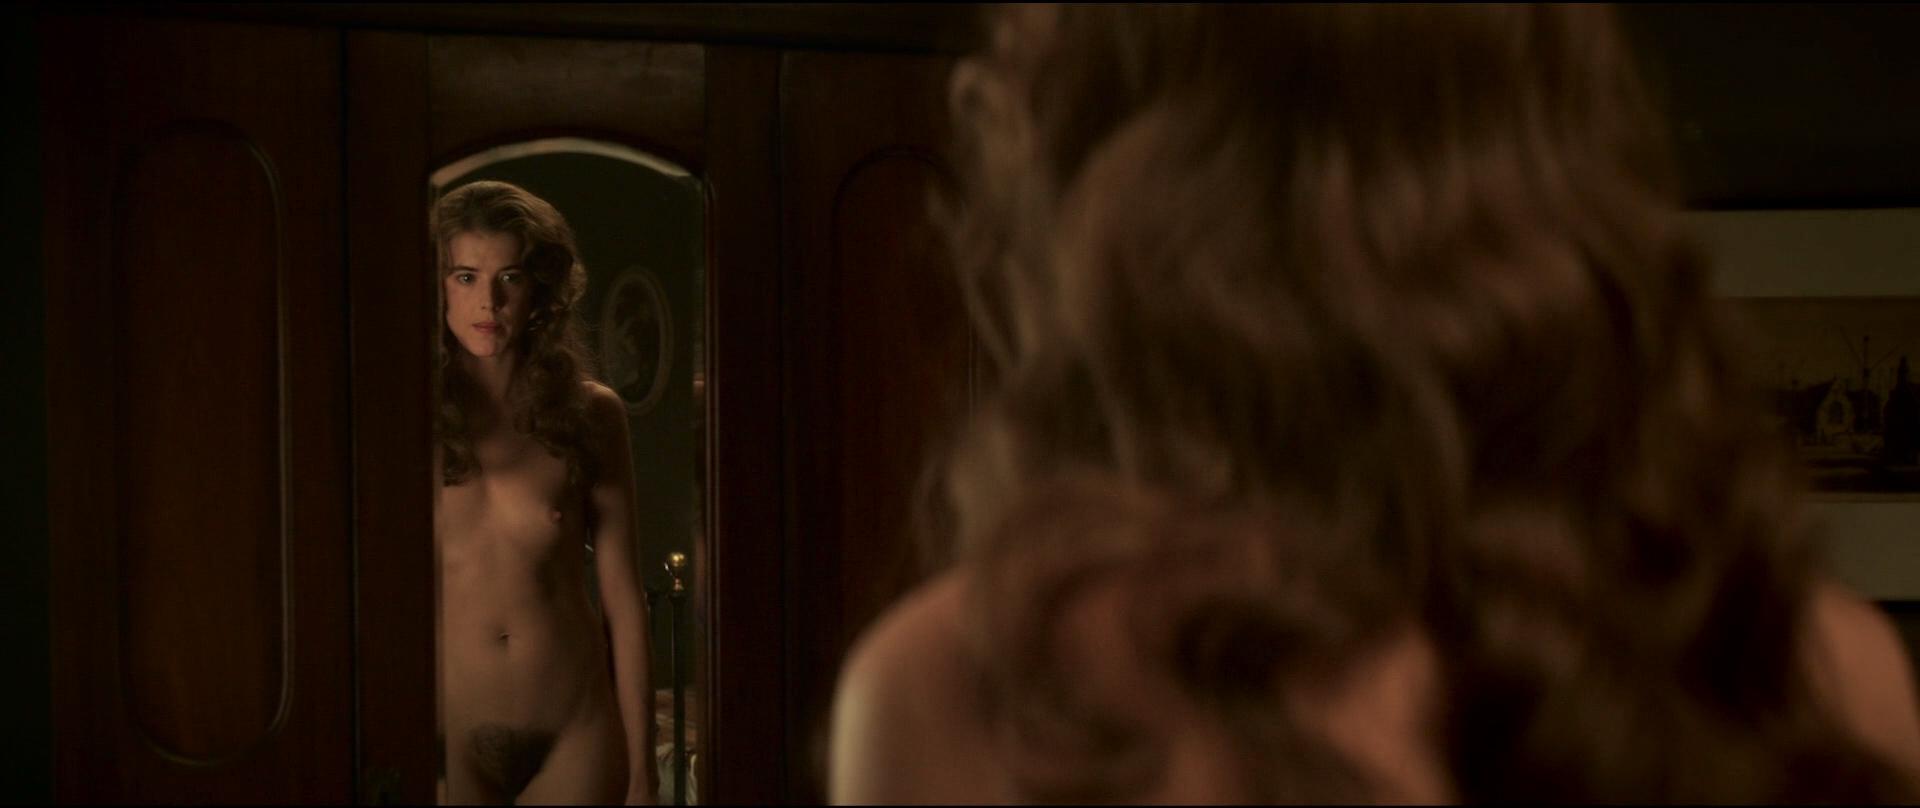 Agyness Deyn nude bush, full frontal and sex - Sunset Song (UK-2015) HD 1080p BluRay (7)